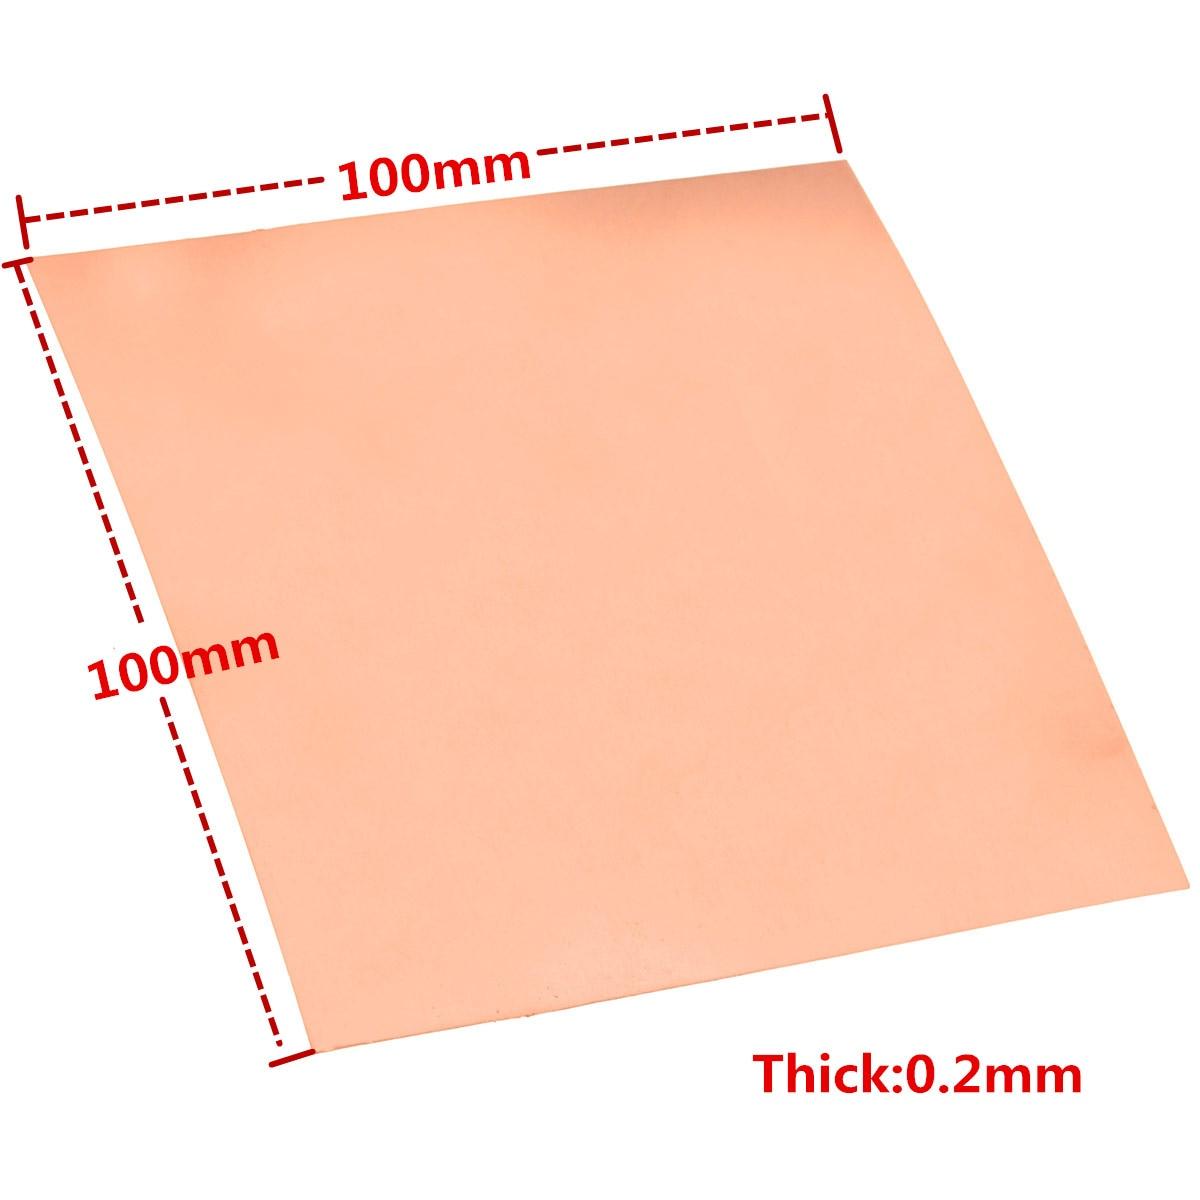 Tmoec 1pcs 999 Pure Copper Cu Metal Sheet Plate 02mm100mm100mm Ccl 1015 Fr4 Glass Fiber Board Pcb Circuit Clad Laminate Package Include 1xcopper